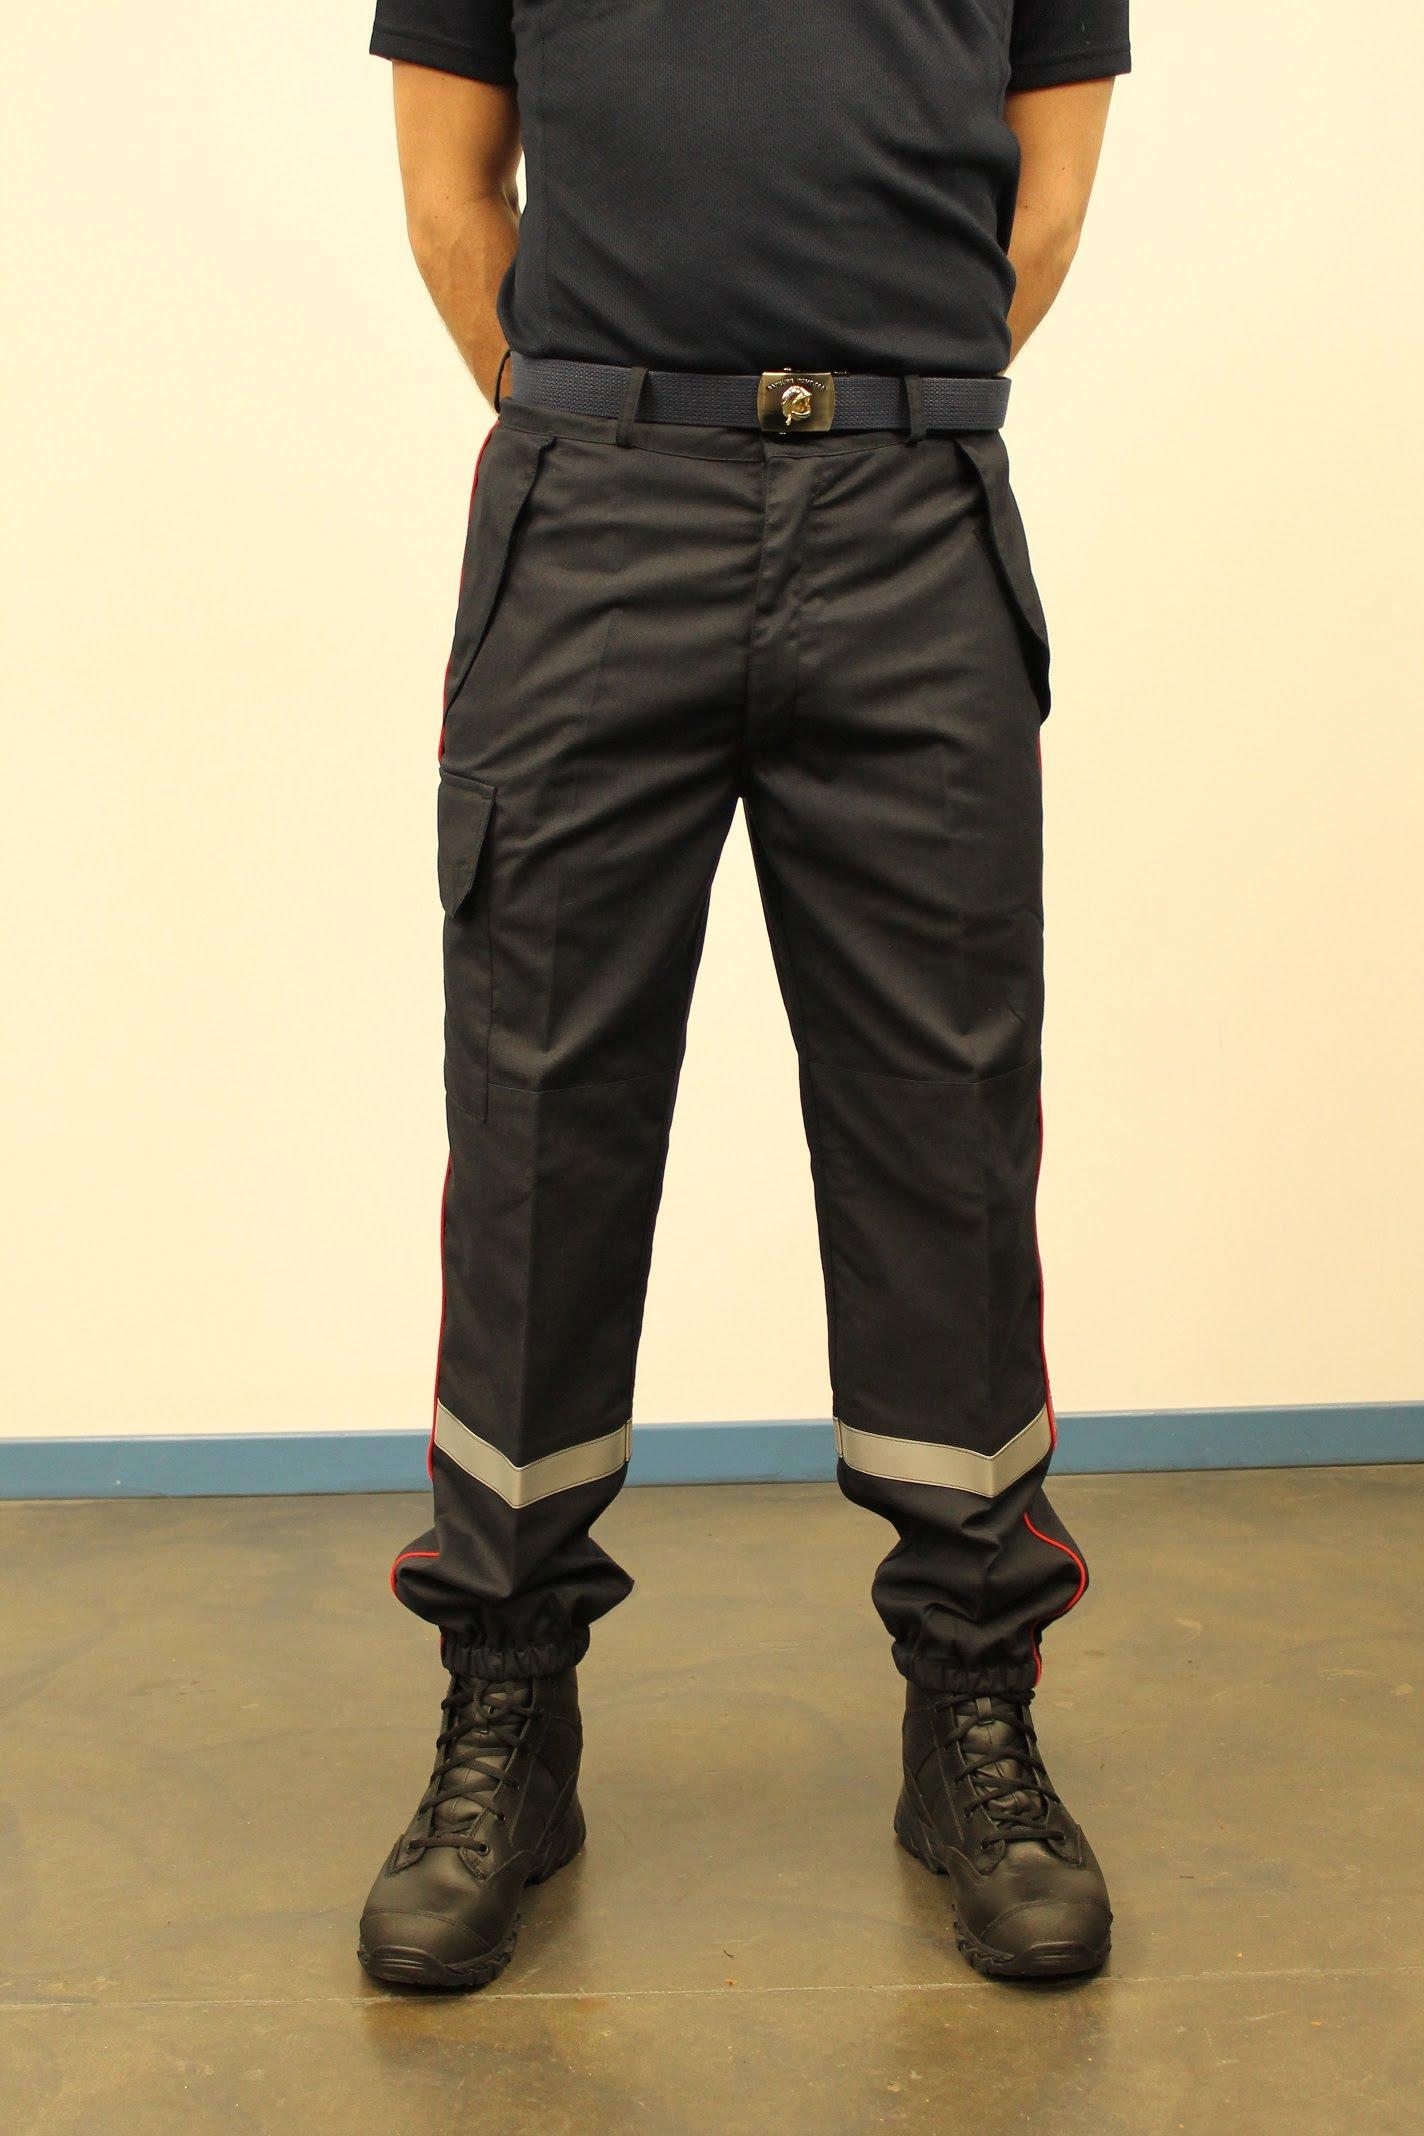 DBB Uniformes fabricant de Tenues Multirisques zone ATEX Pompiers